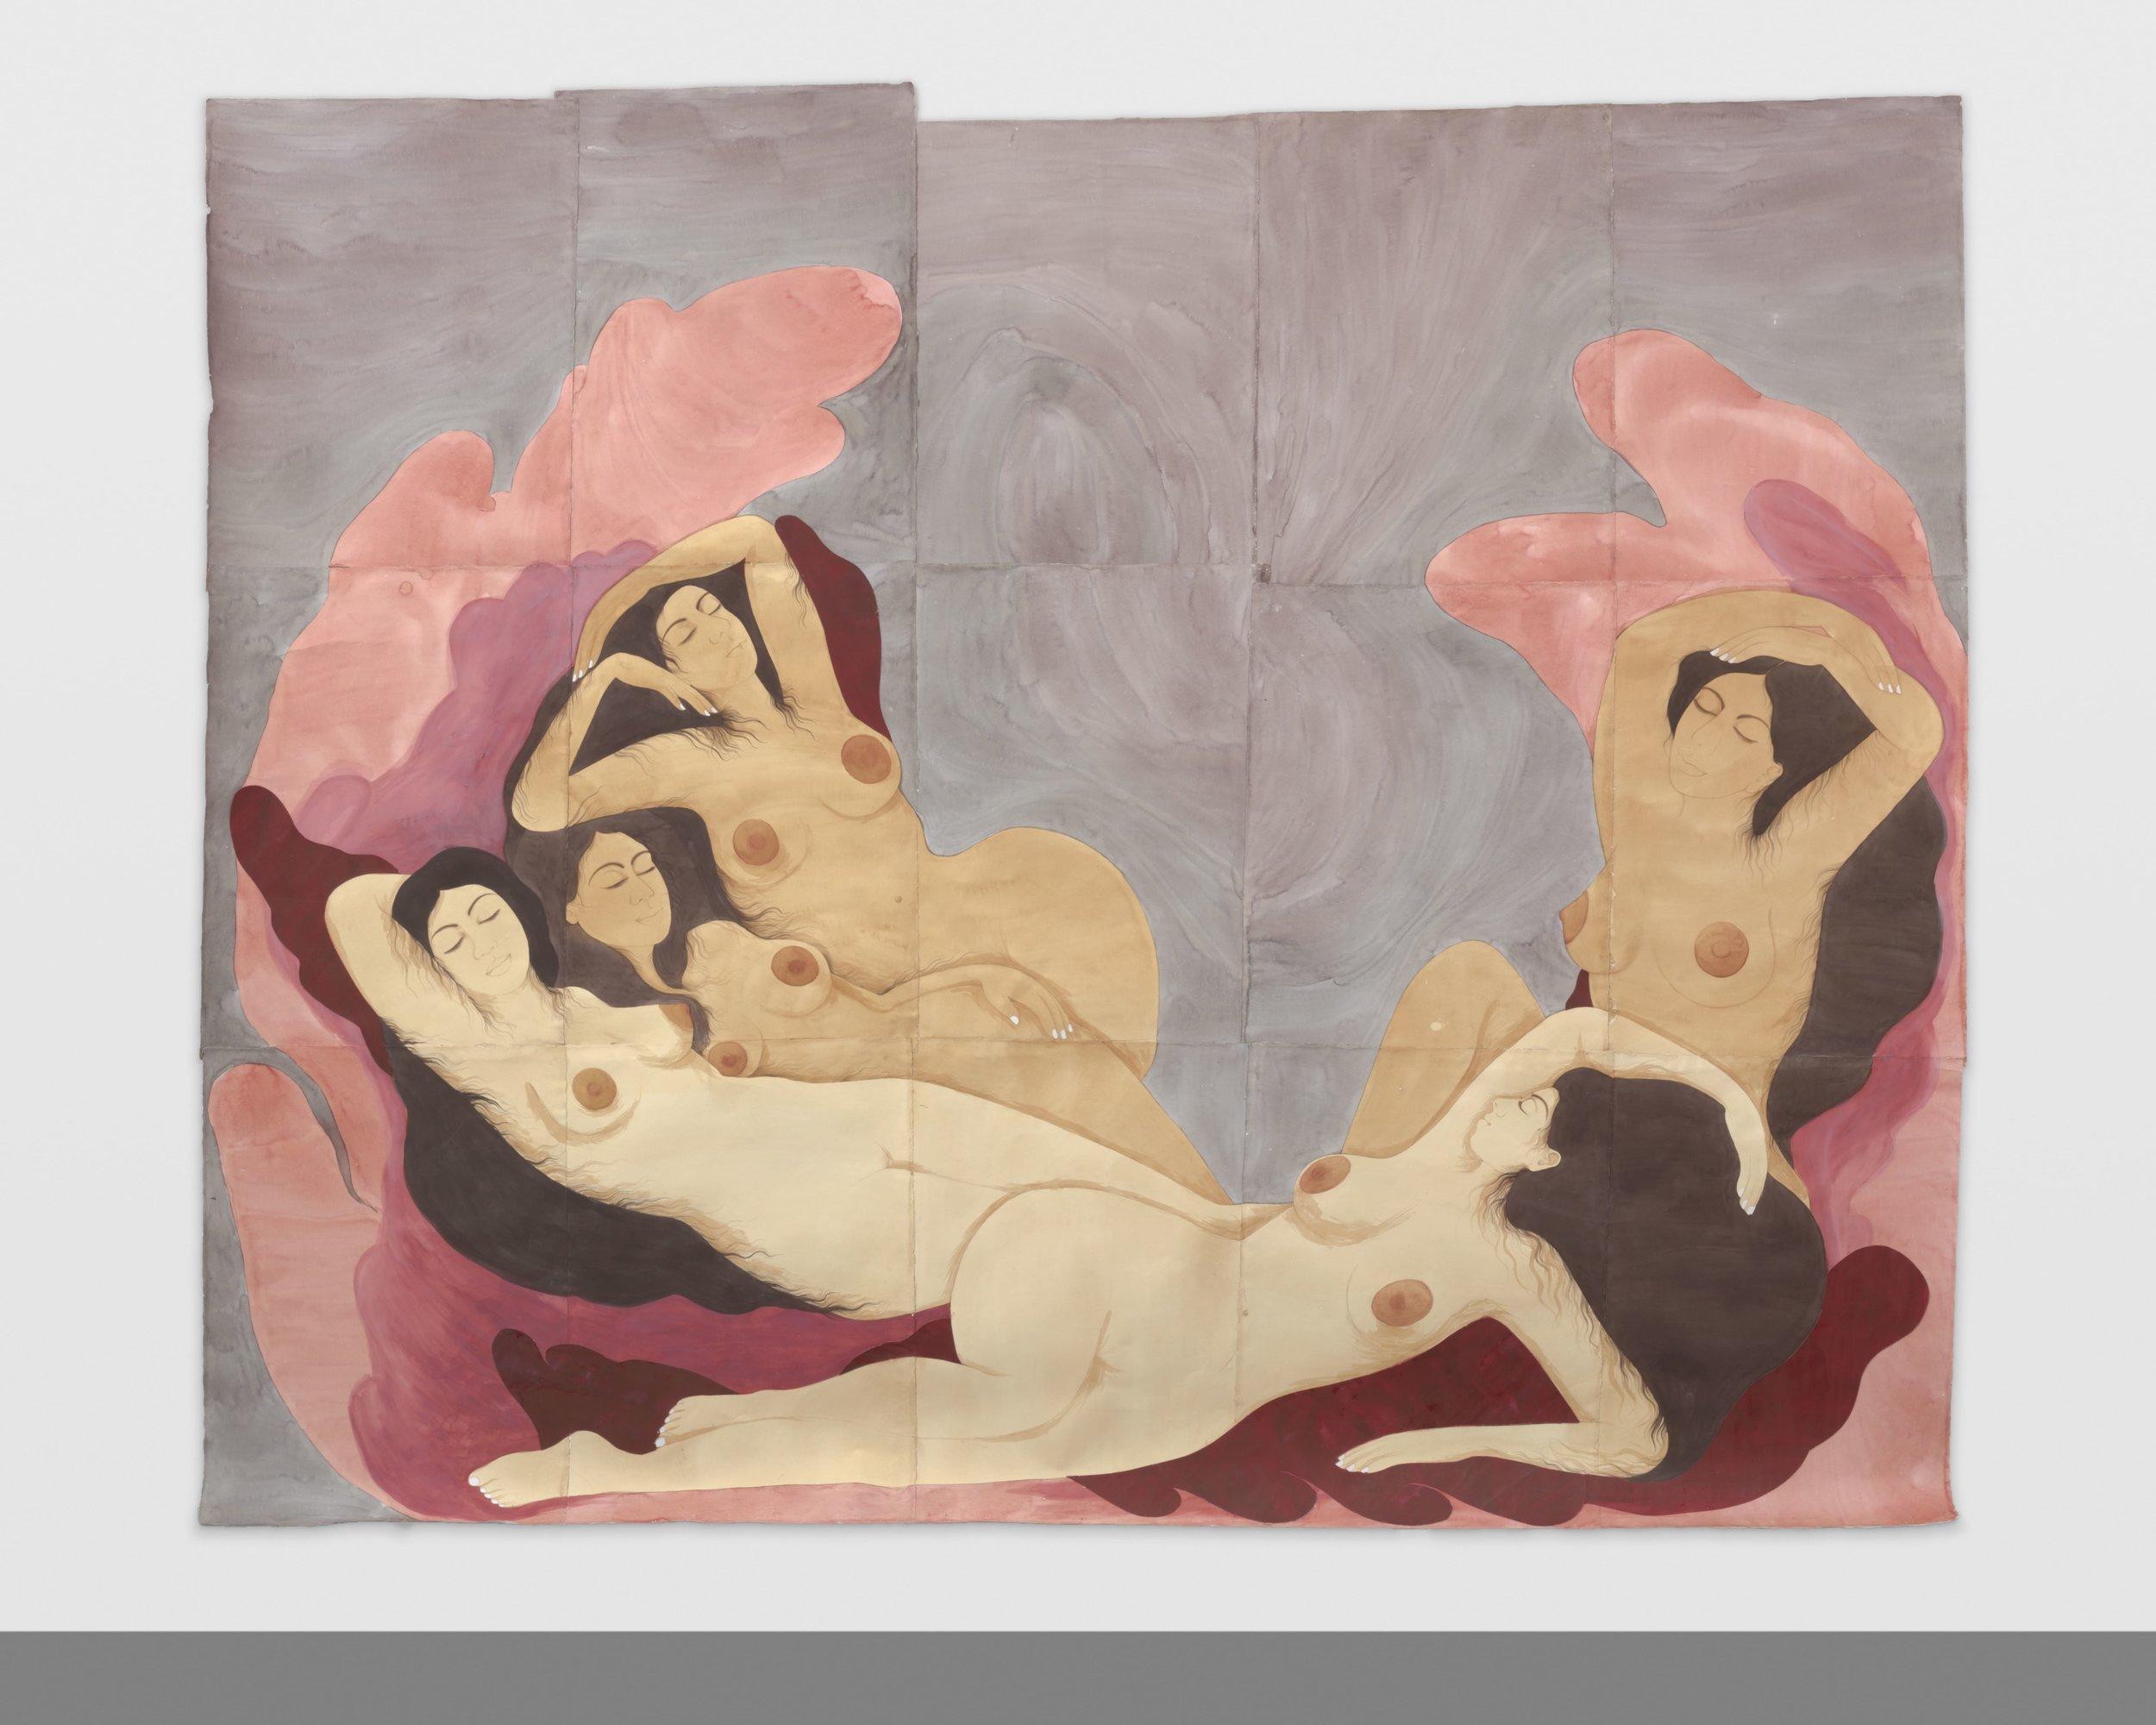 Hiba Schahbaz// Dreamers // Tea, watercolor and gouache on Twinrocker (handmade paper) // 105 x 87 Inches // 2018